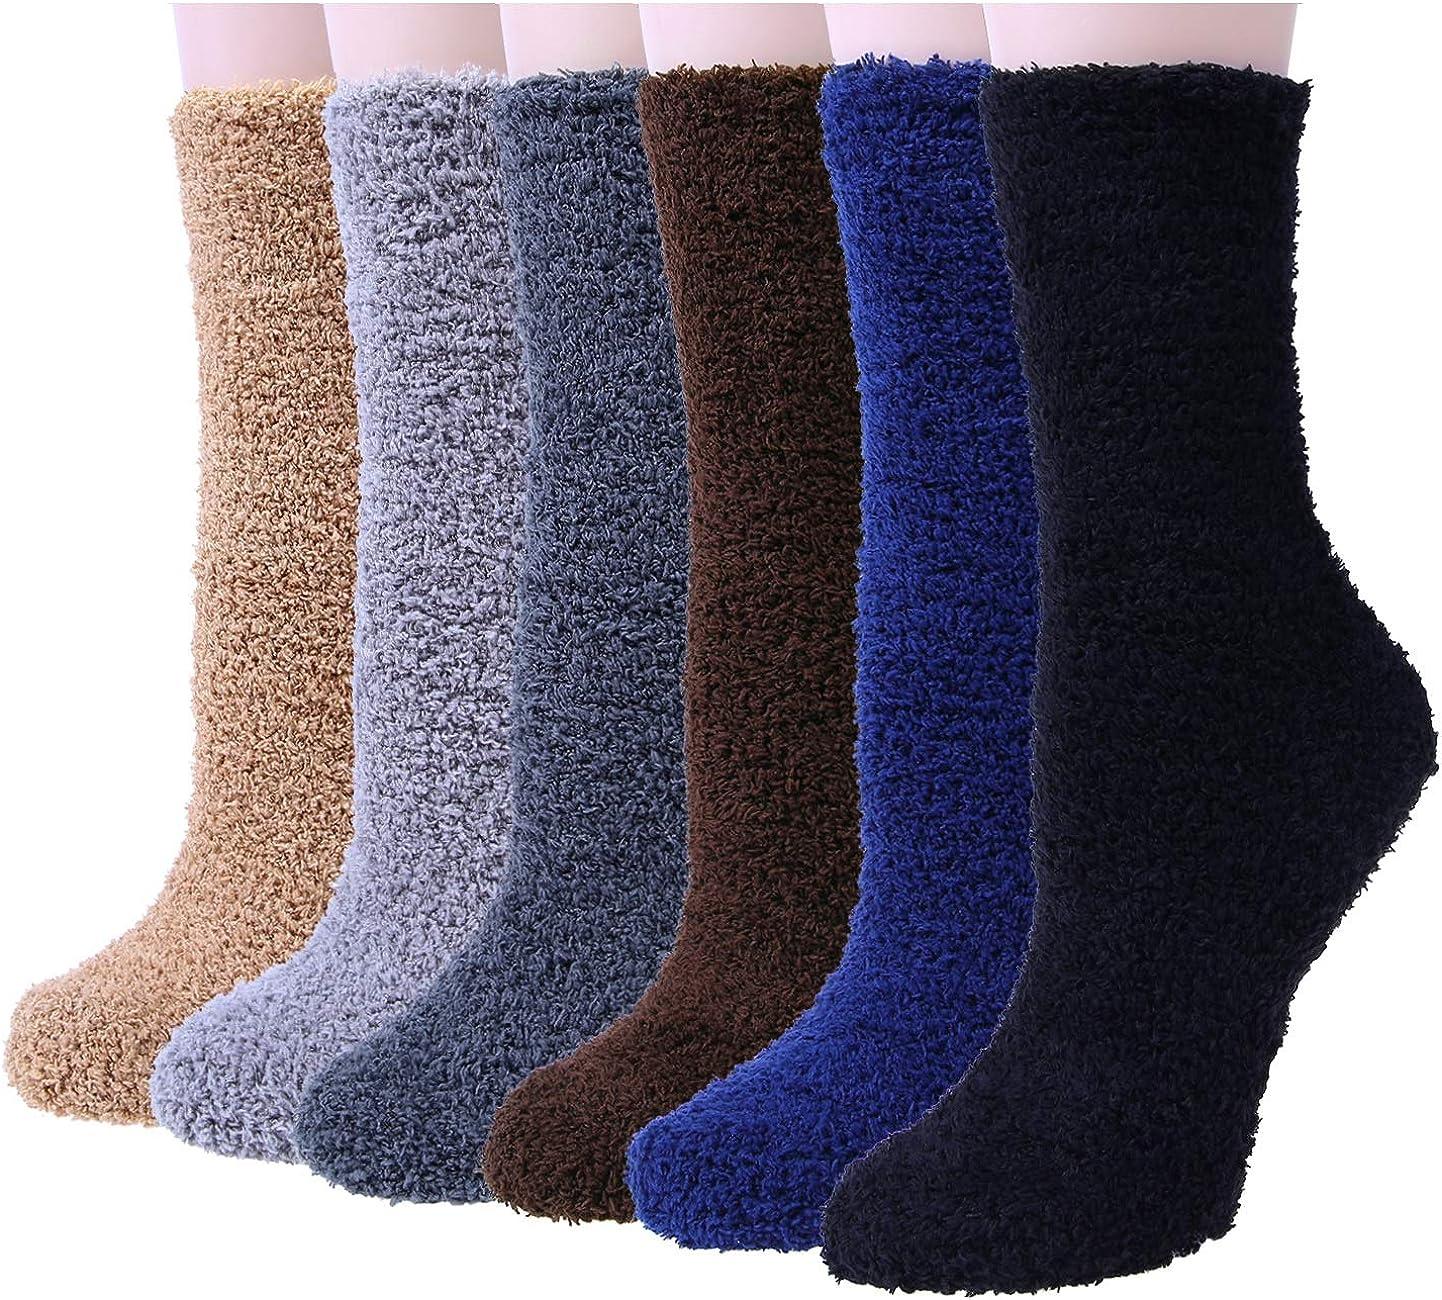 6 Pairs Women Fuzzy Fluffy Cozy Slipper Socks Warm Soft Winter Plush Home Sleeping Socks